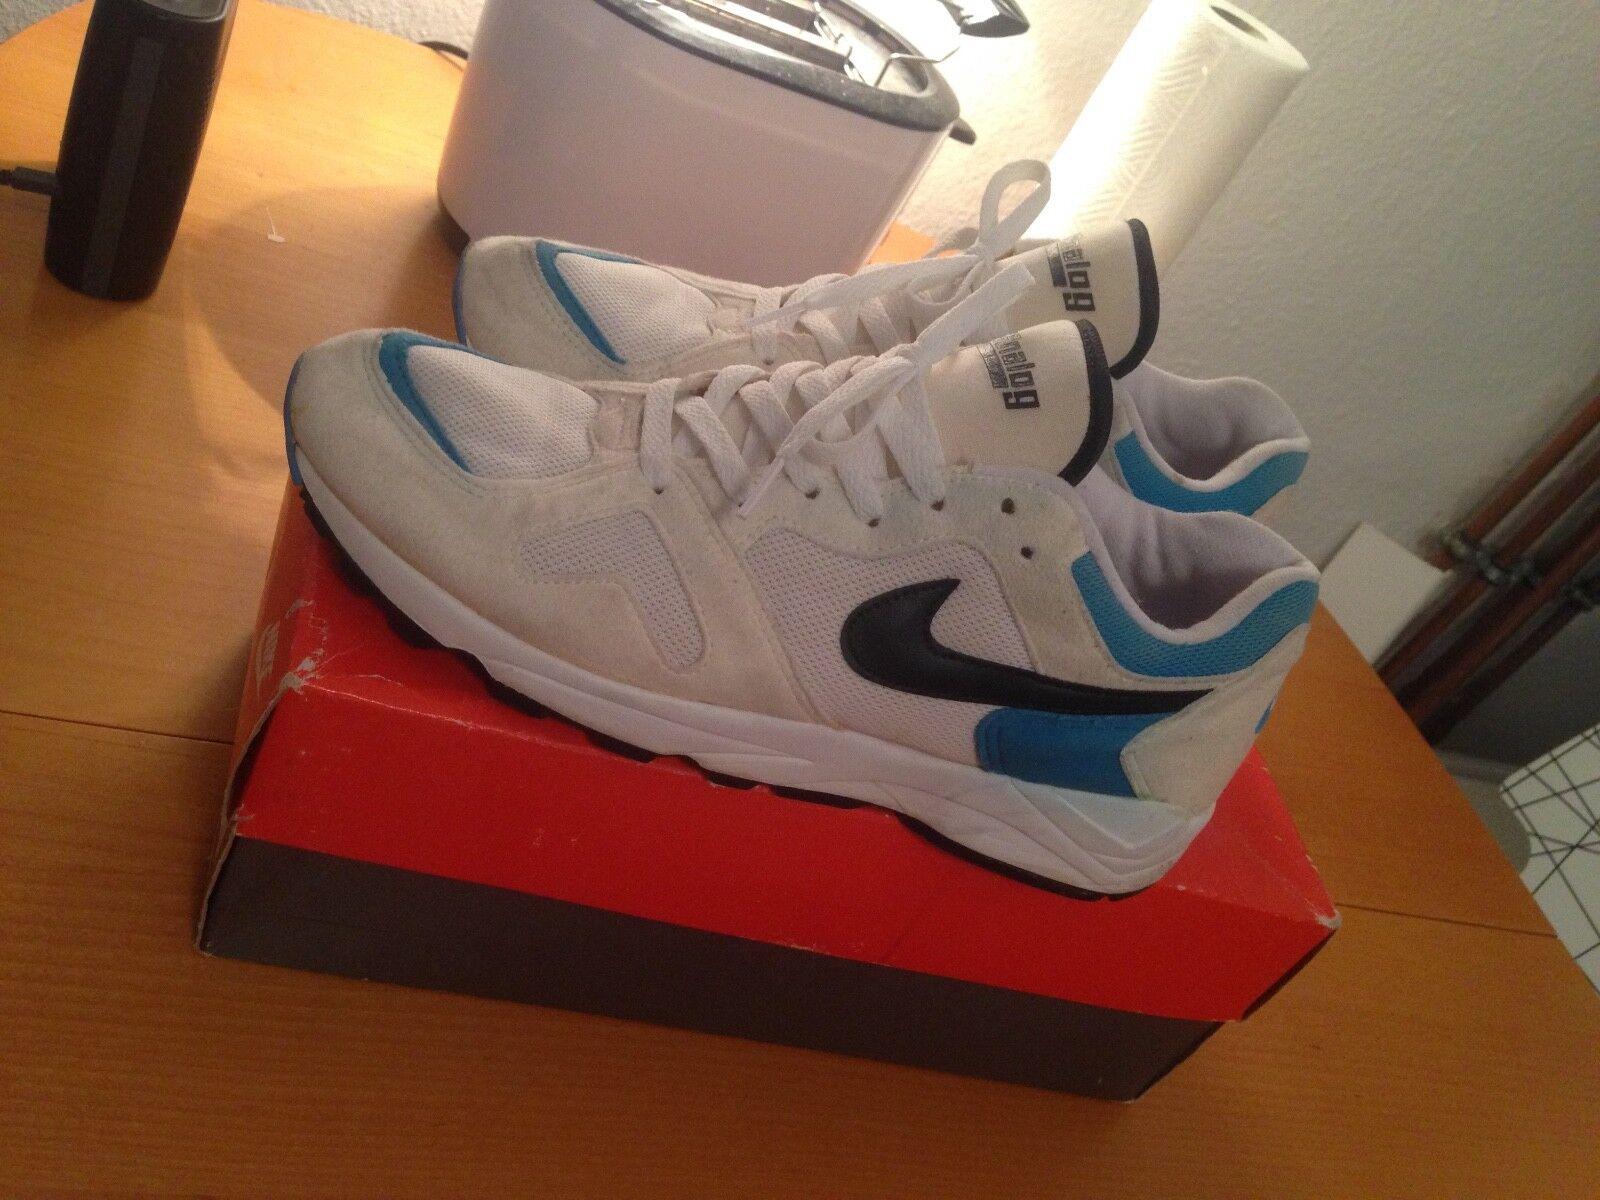 Nike Air Analog Vintage 1992 Blue/White